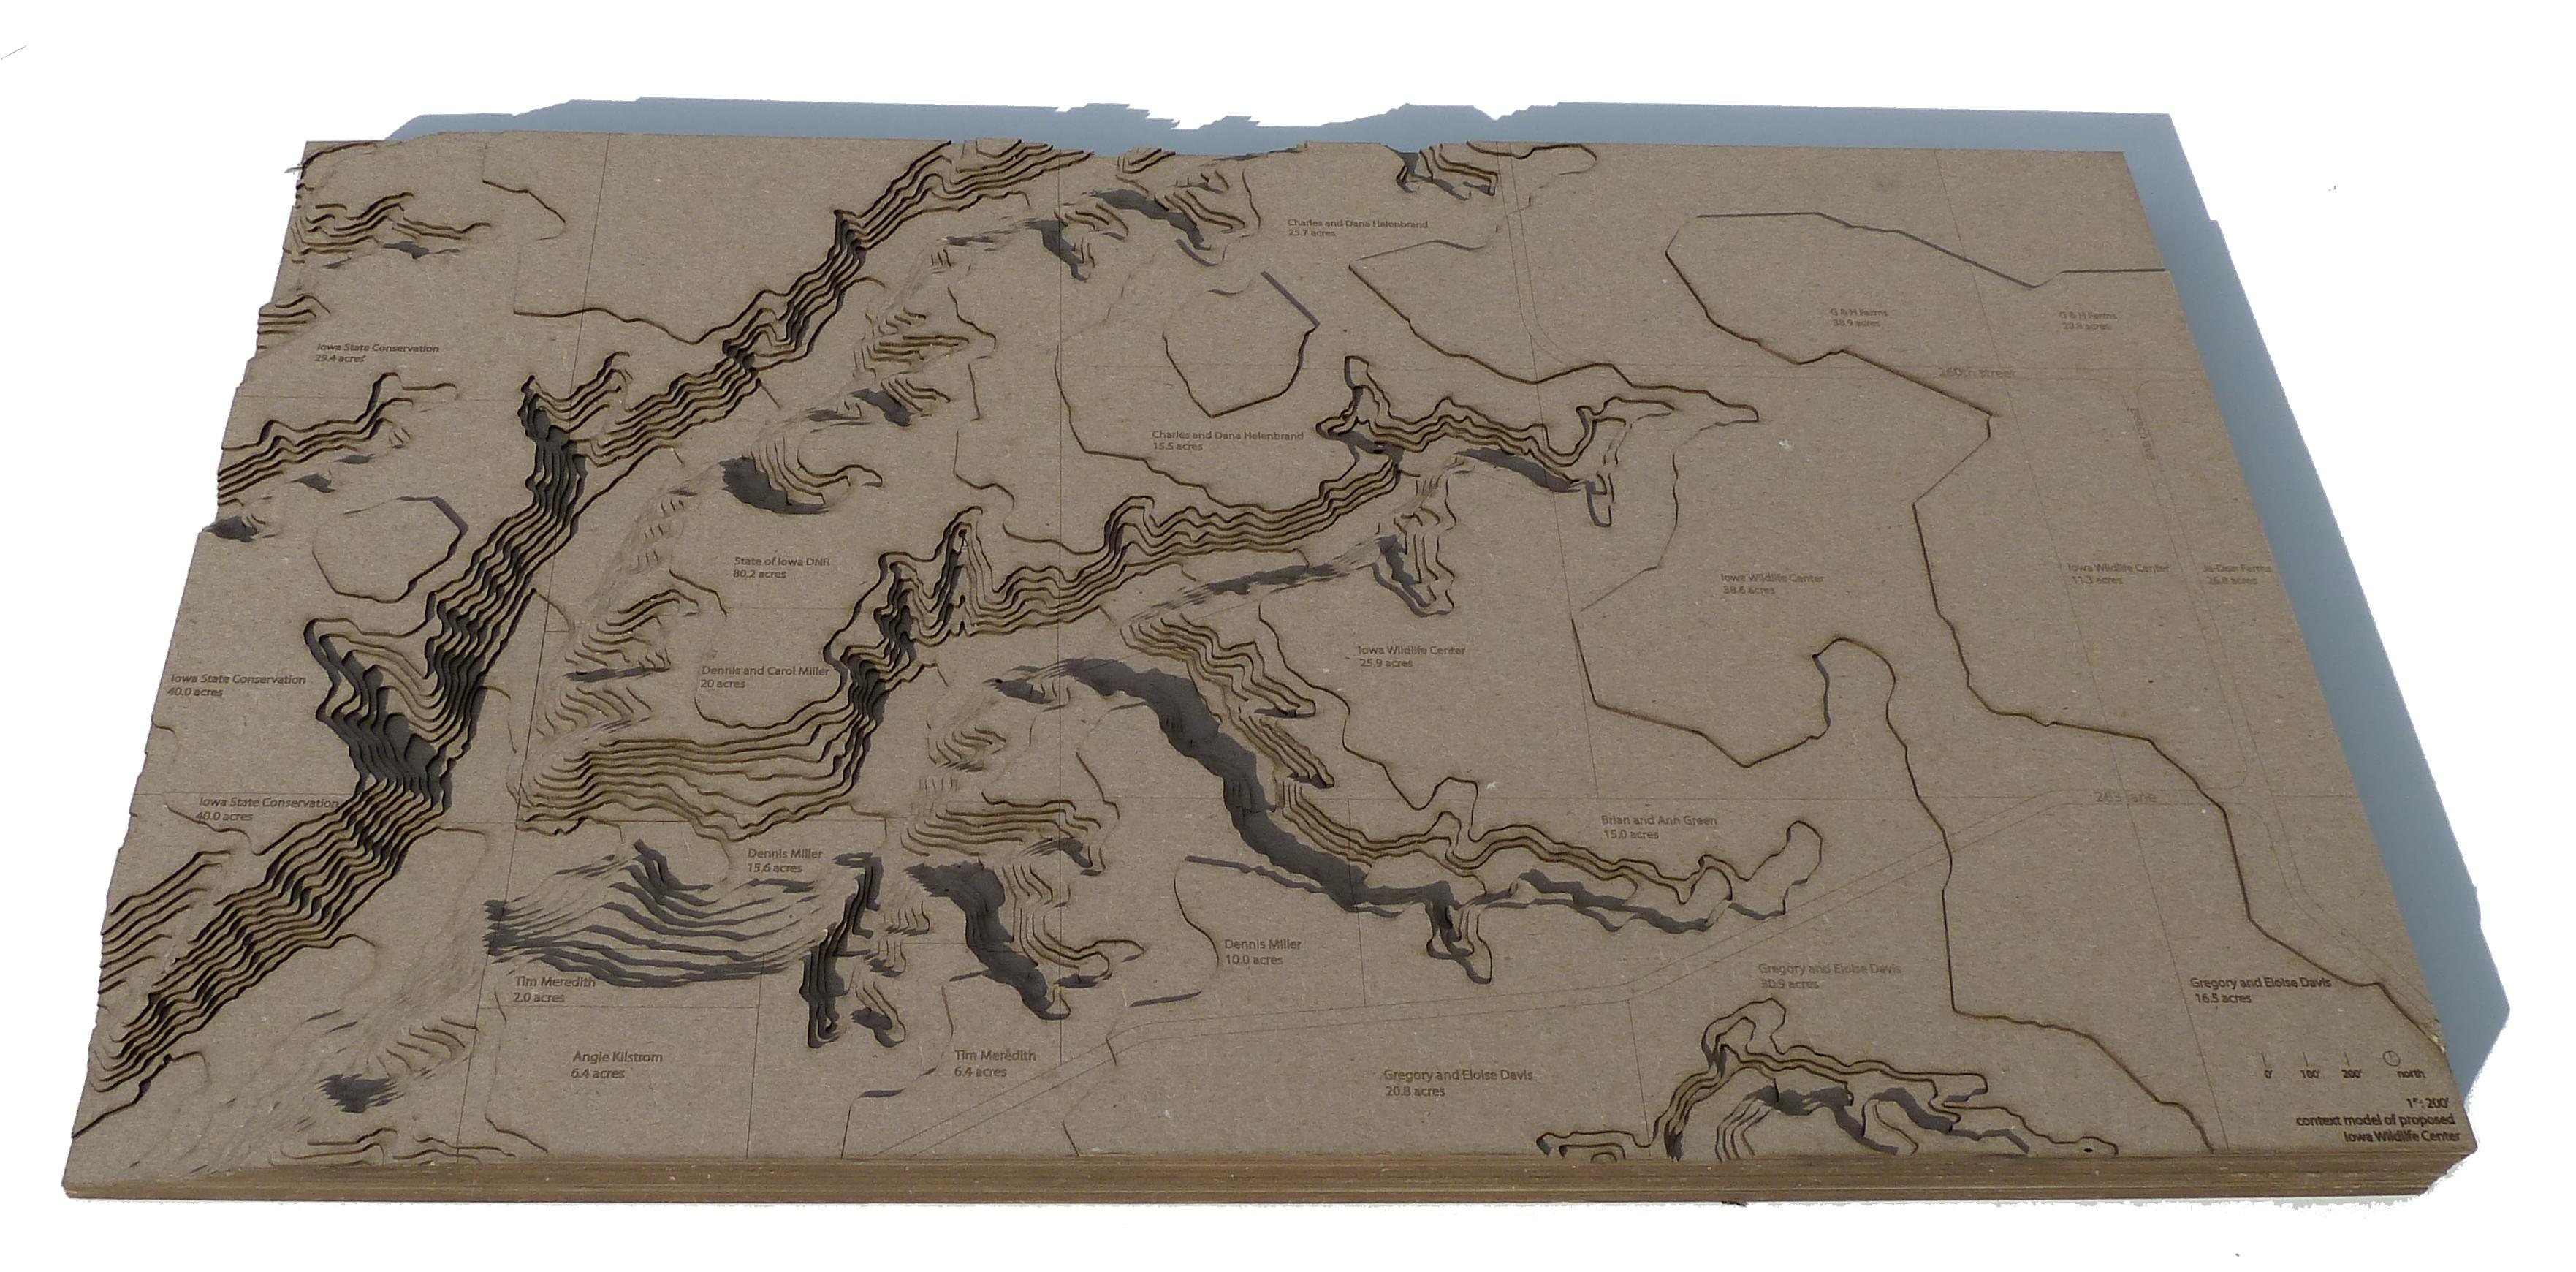 Create a Site Toporaphic Model using a Laser Cutter